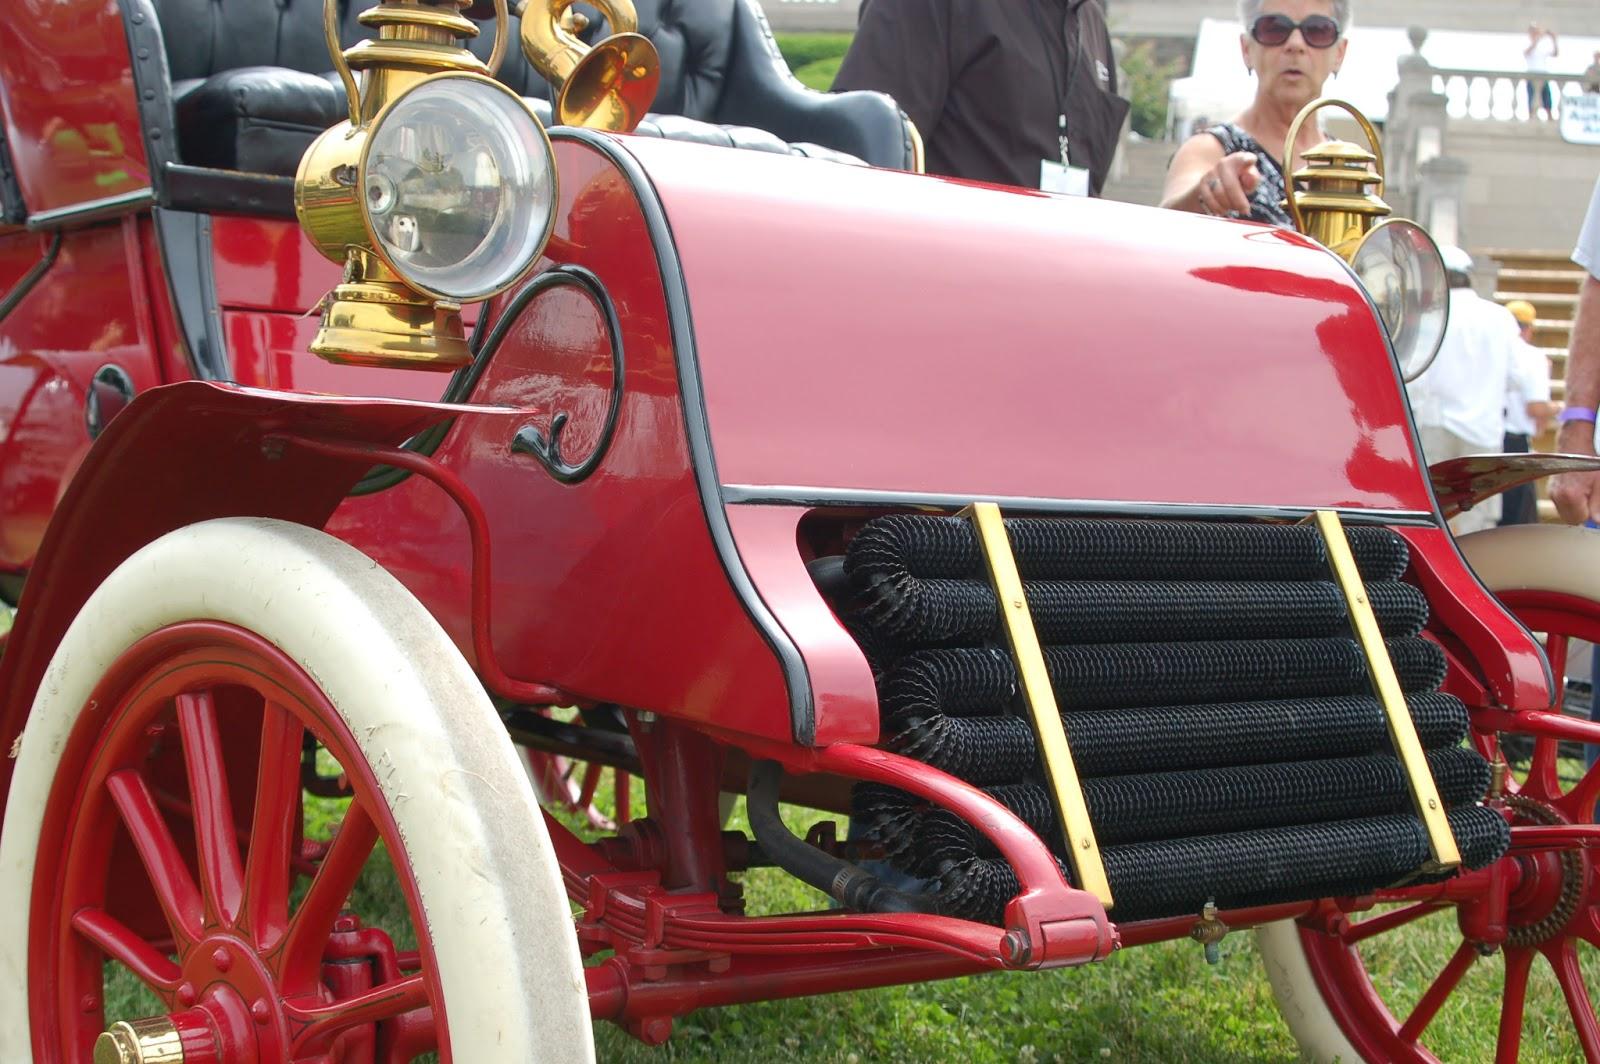 Turnerbudds Car Blog: Postponed Due to Rain: Bring on the Vintage